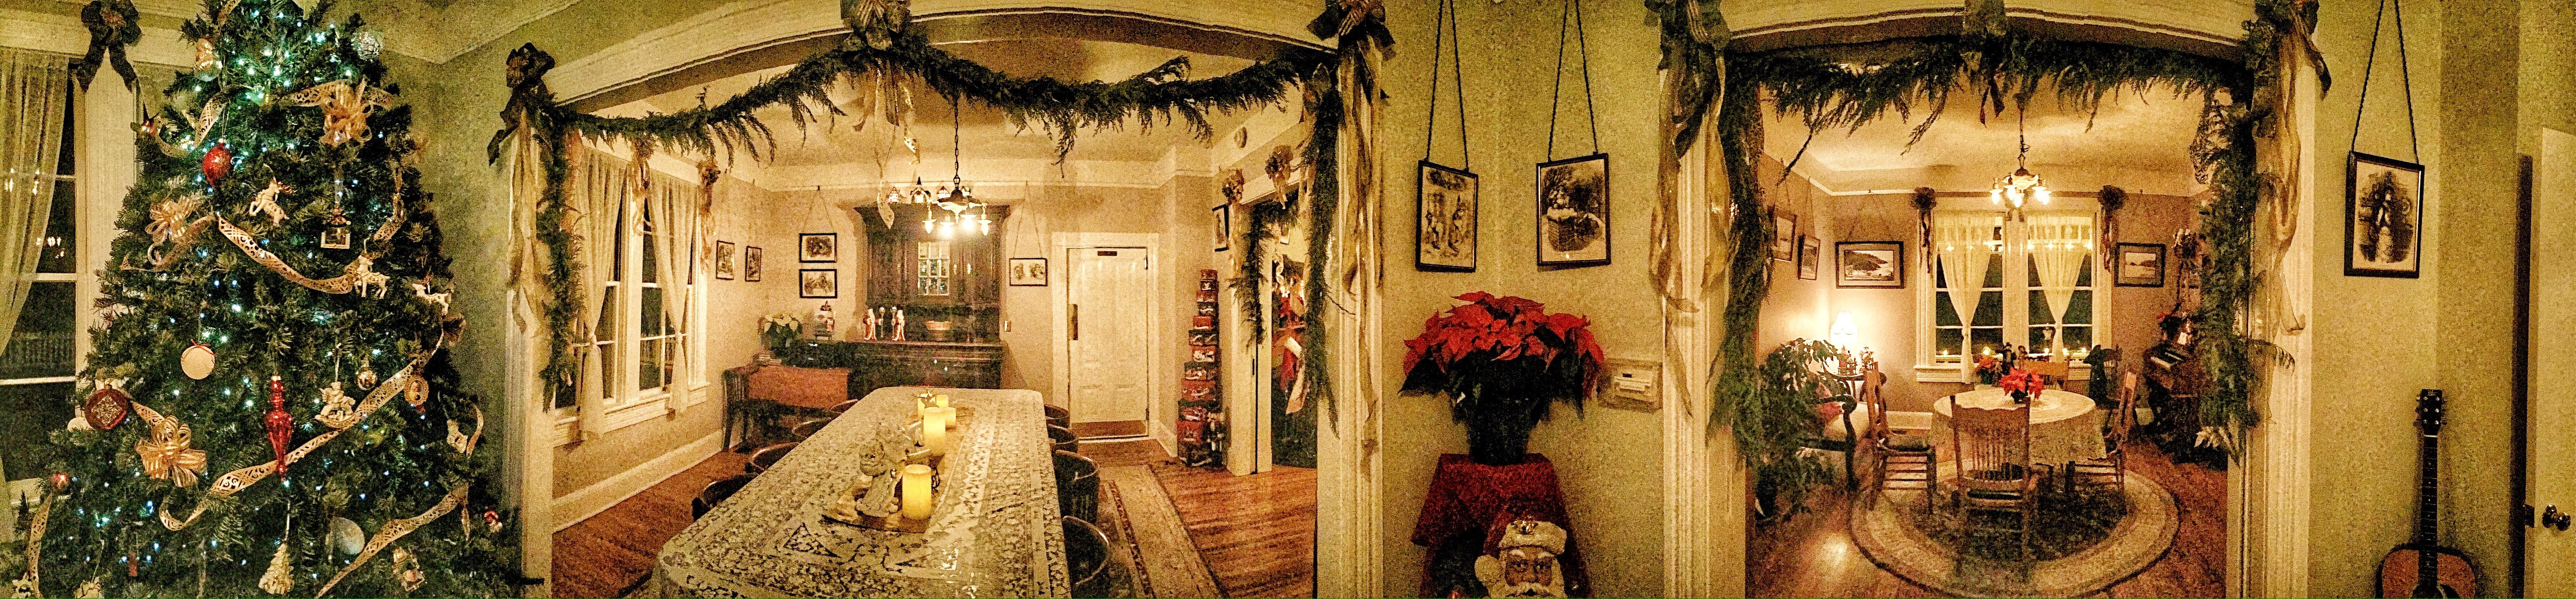 Christmas Overnight special